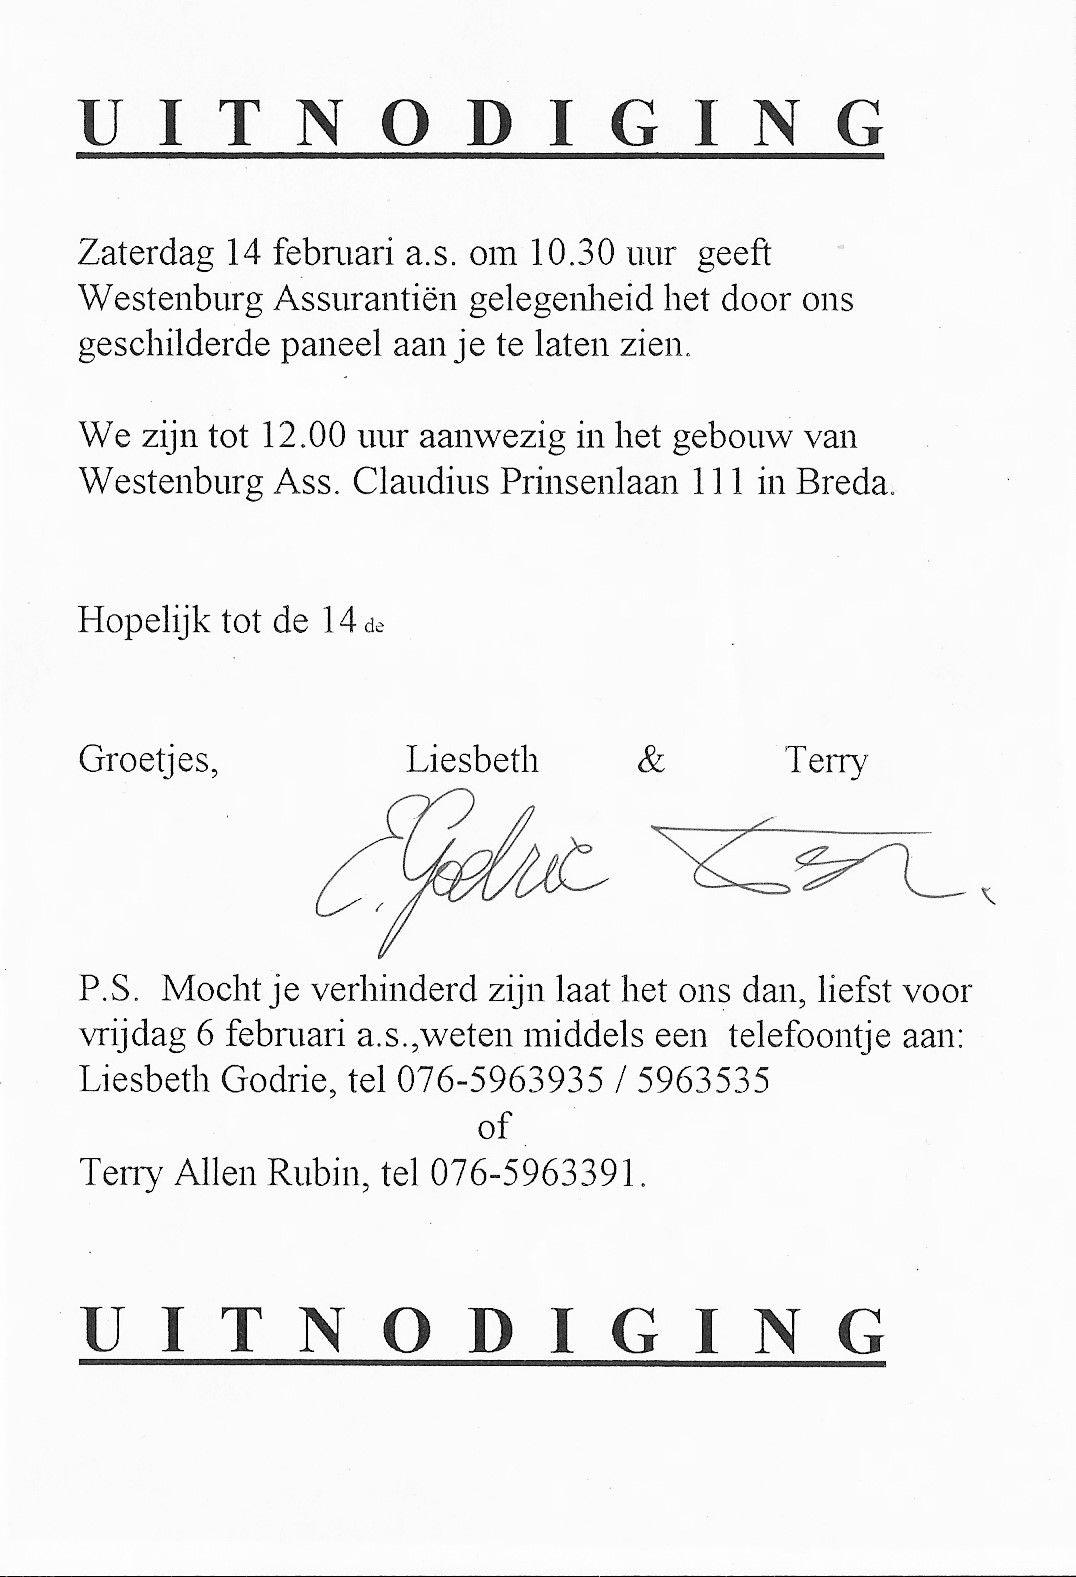 TAR uitnodiging bij WESENBURG BREDA 2000  1=